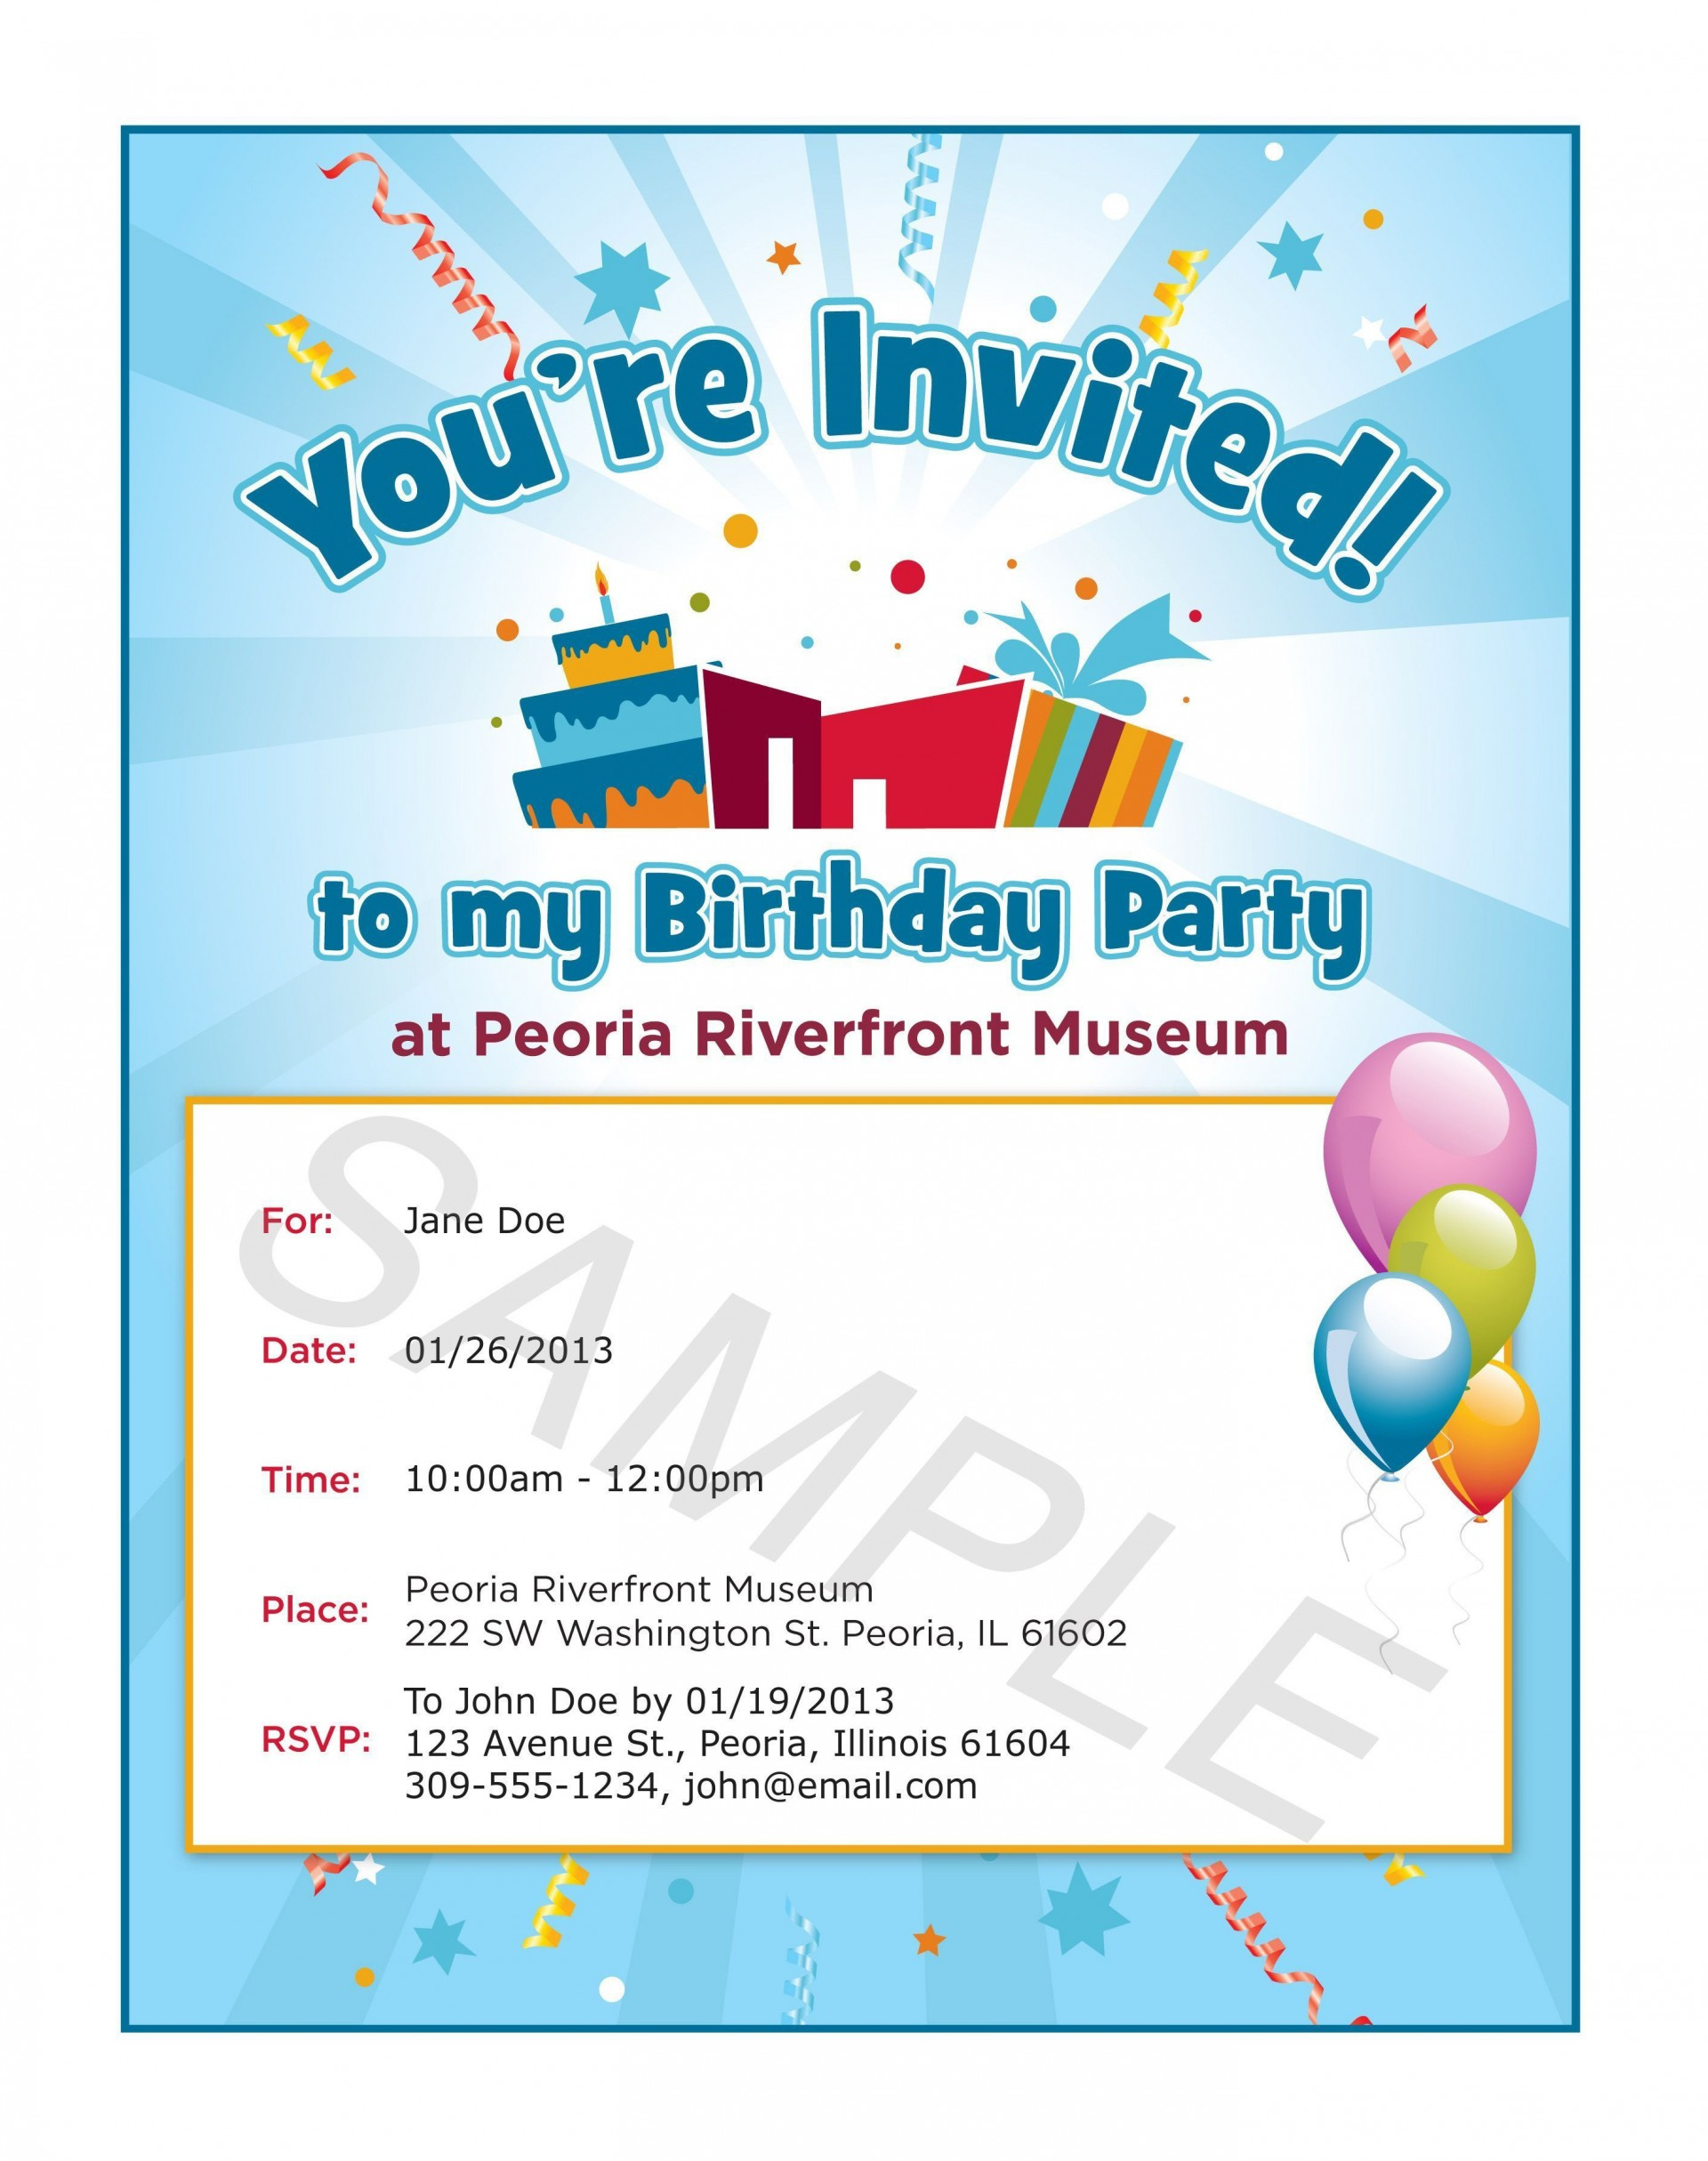 005 Shocking Birthday Invitation Wording Example High Def  Examples Party Invite Brunch Idea1920